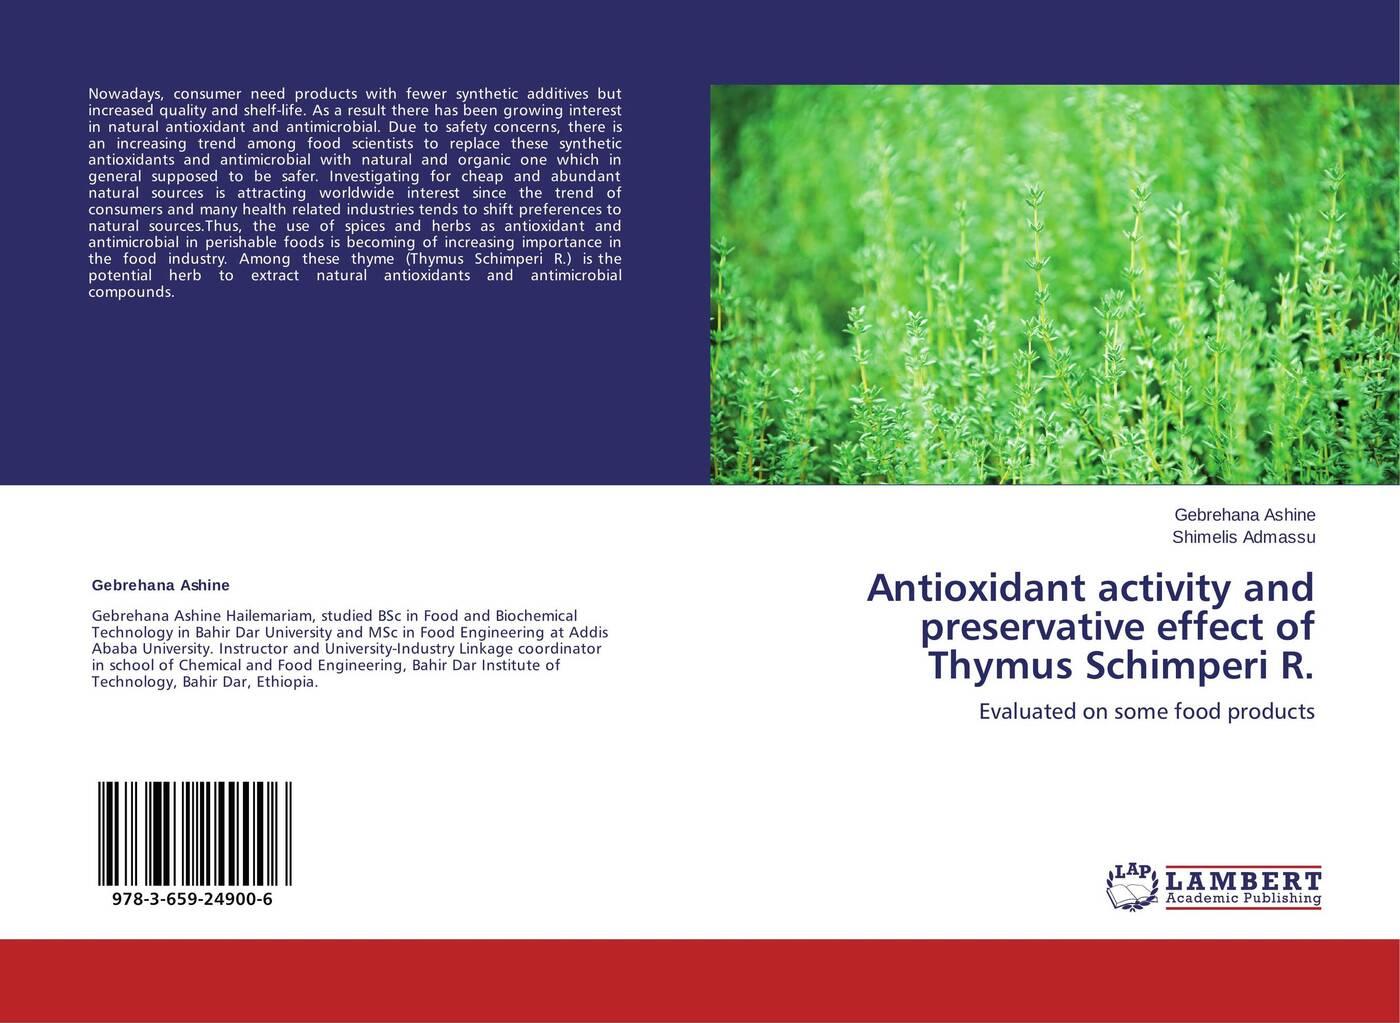 Gebrehana Ashine and Shimelis Admassu Antioxidant activity and preservative effect of Thymus Schimperi R. showkat ganie and shajr ul amin antioxidant